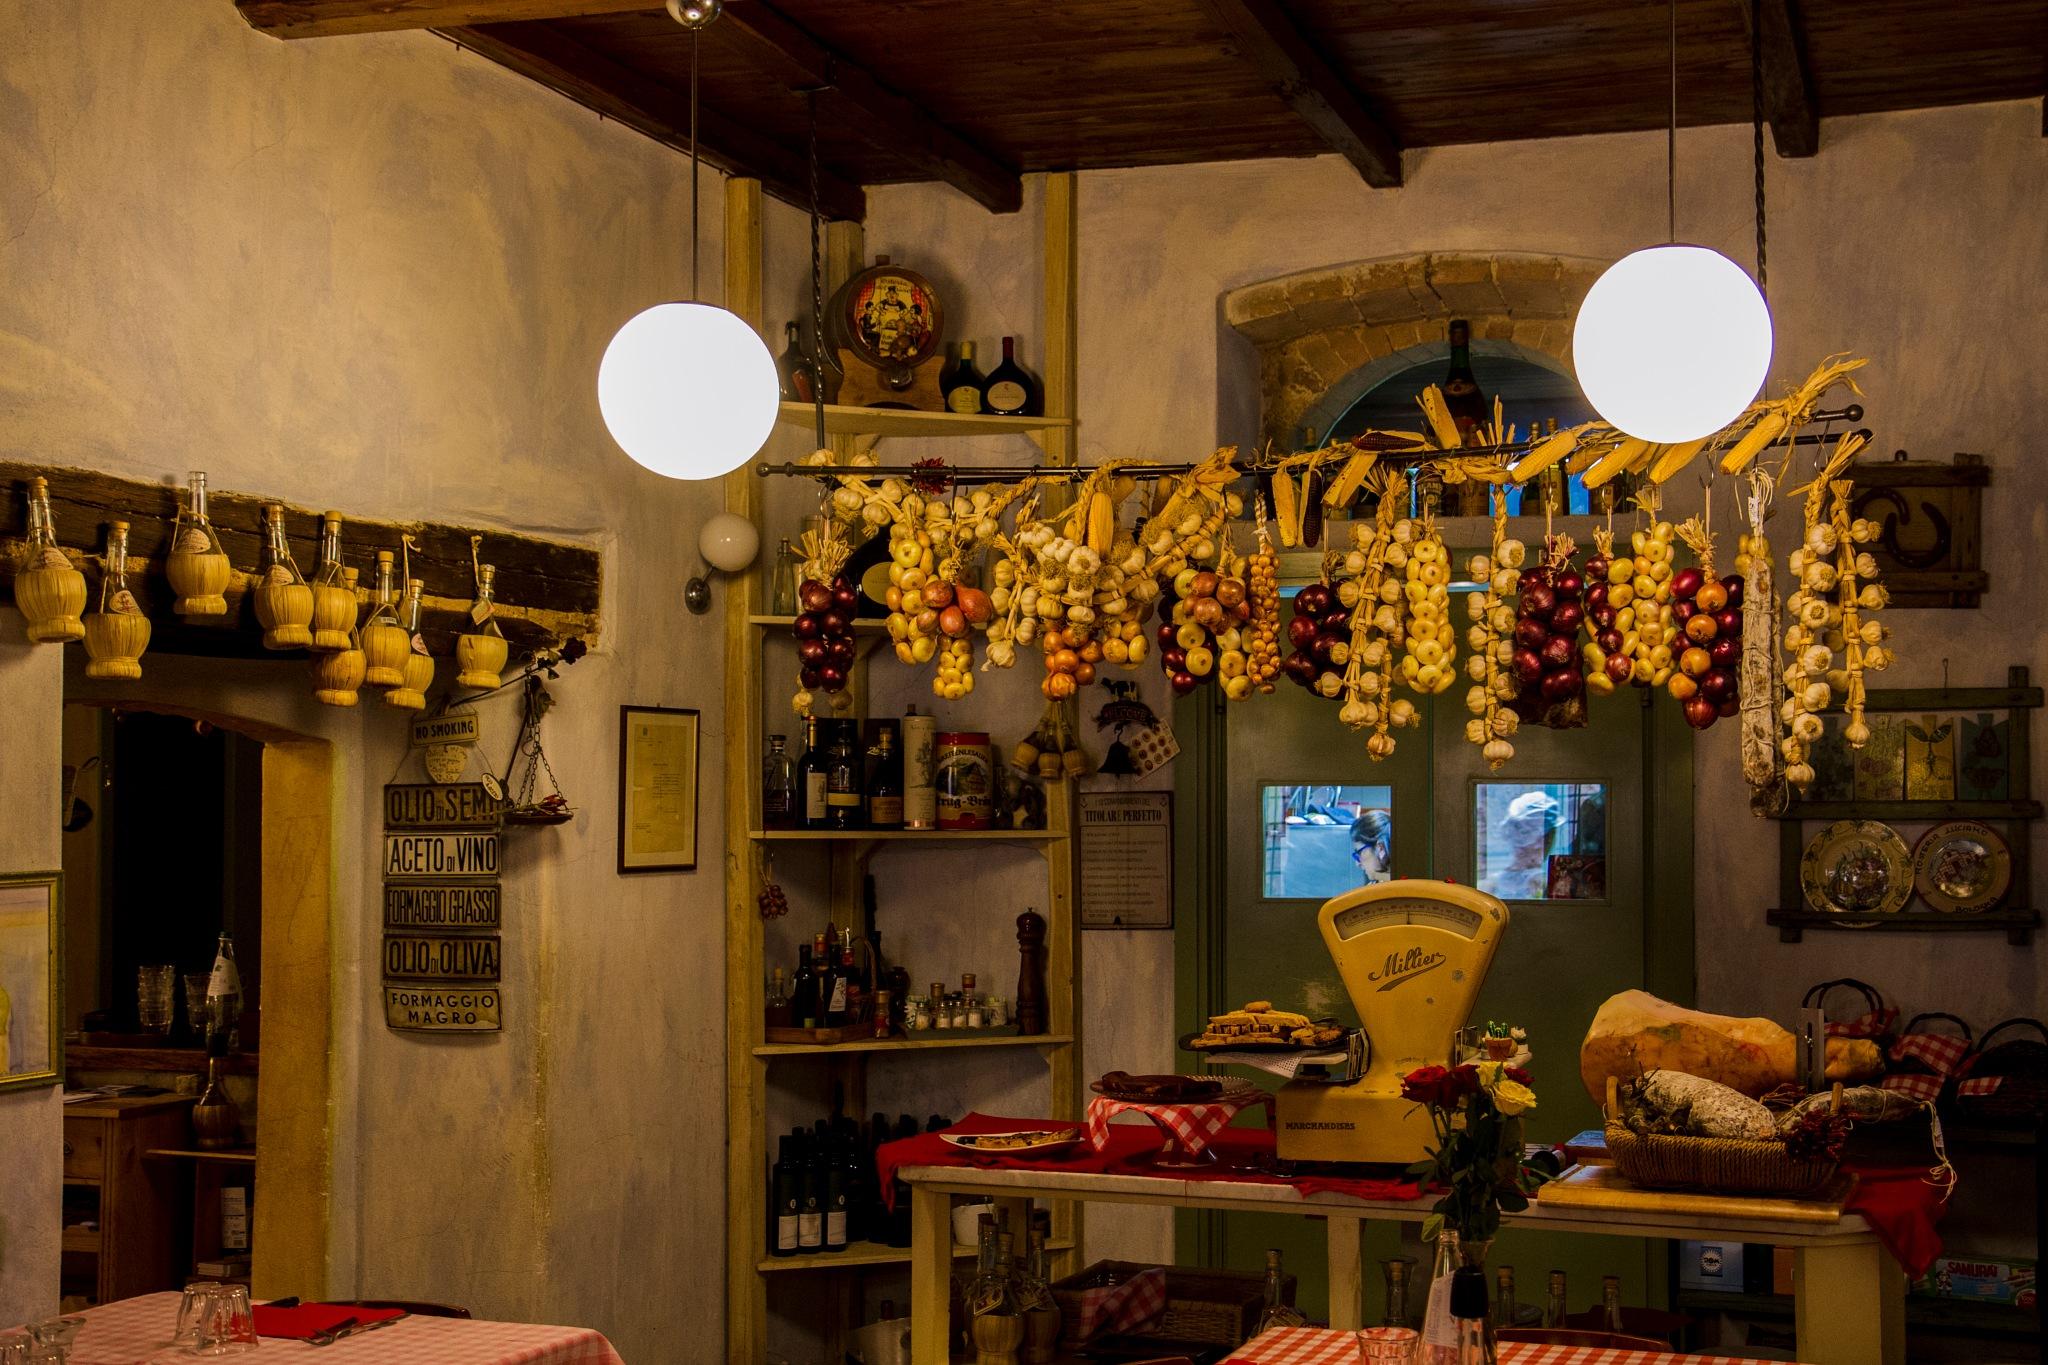 What a nice restaurant......!! by Giovanni Battagliola